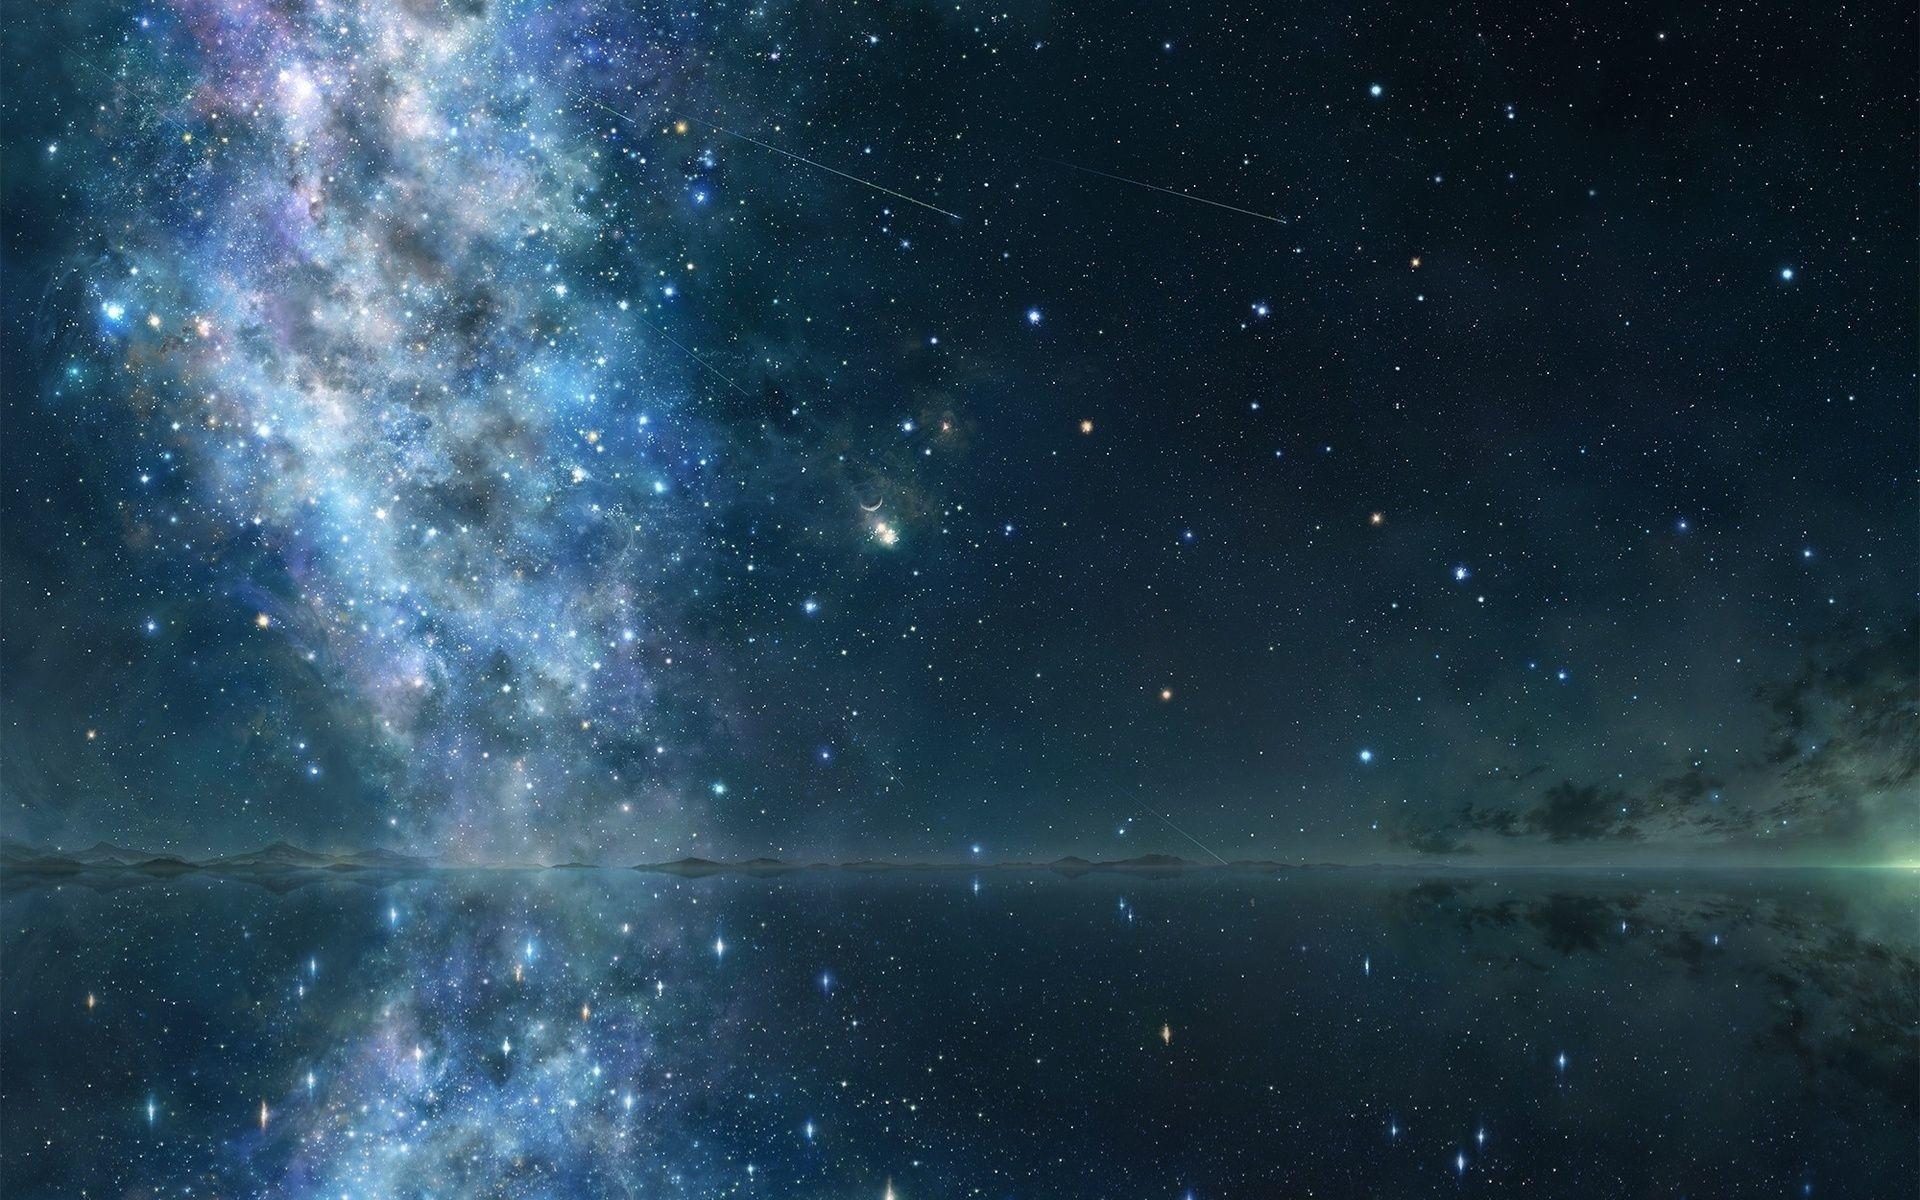 Lakes reflection star stars sky night wallpaper